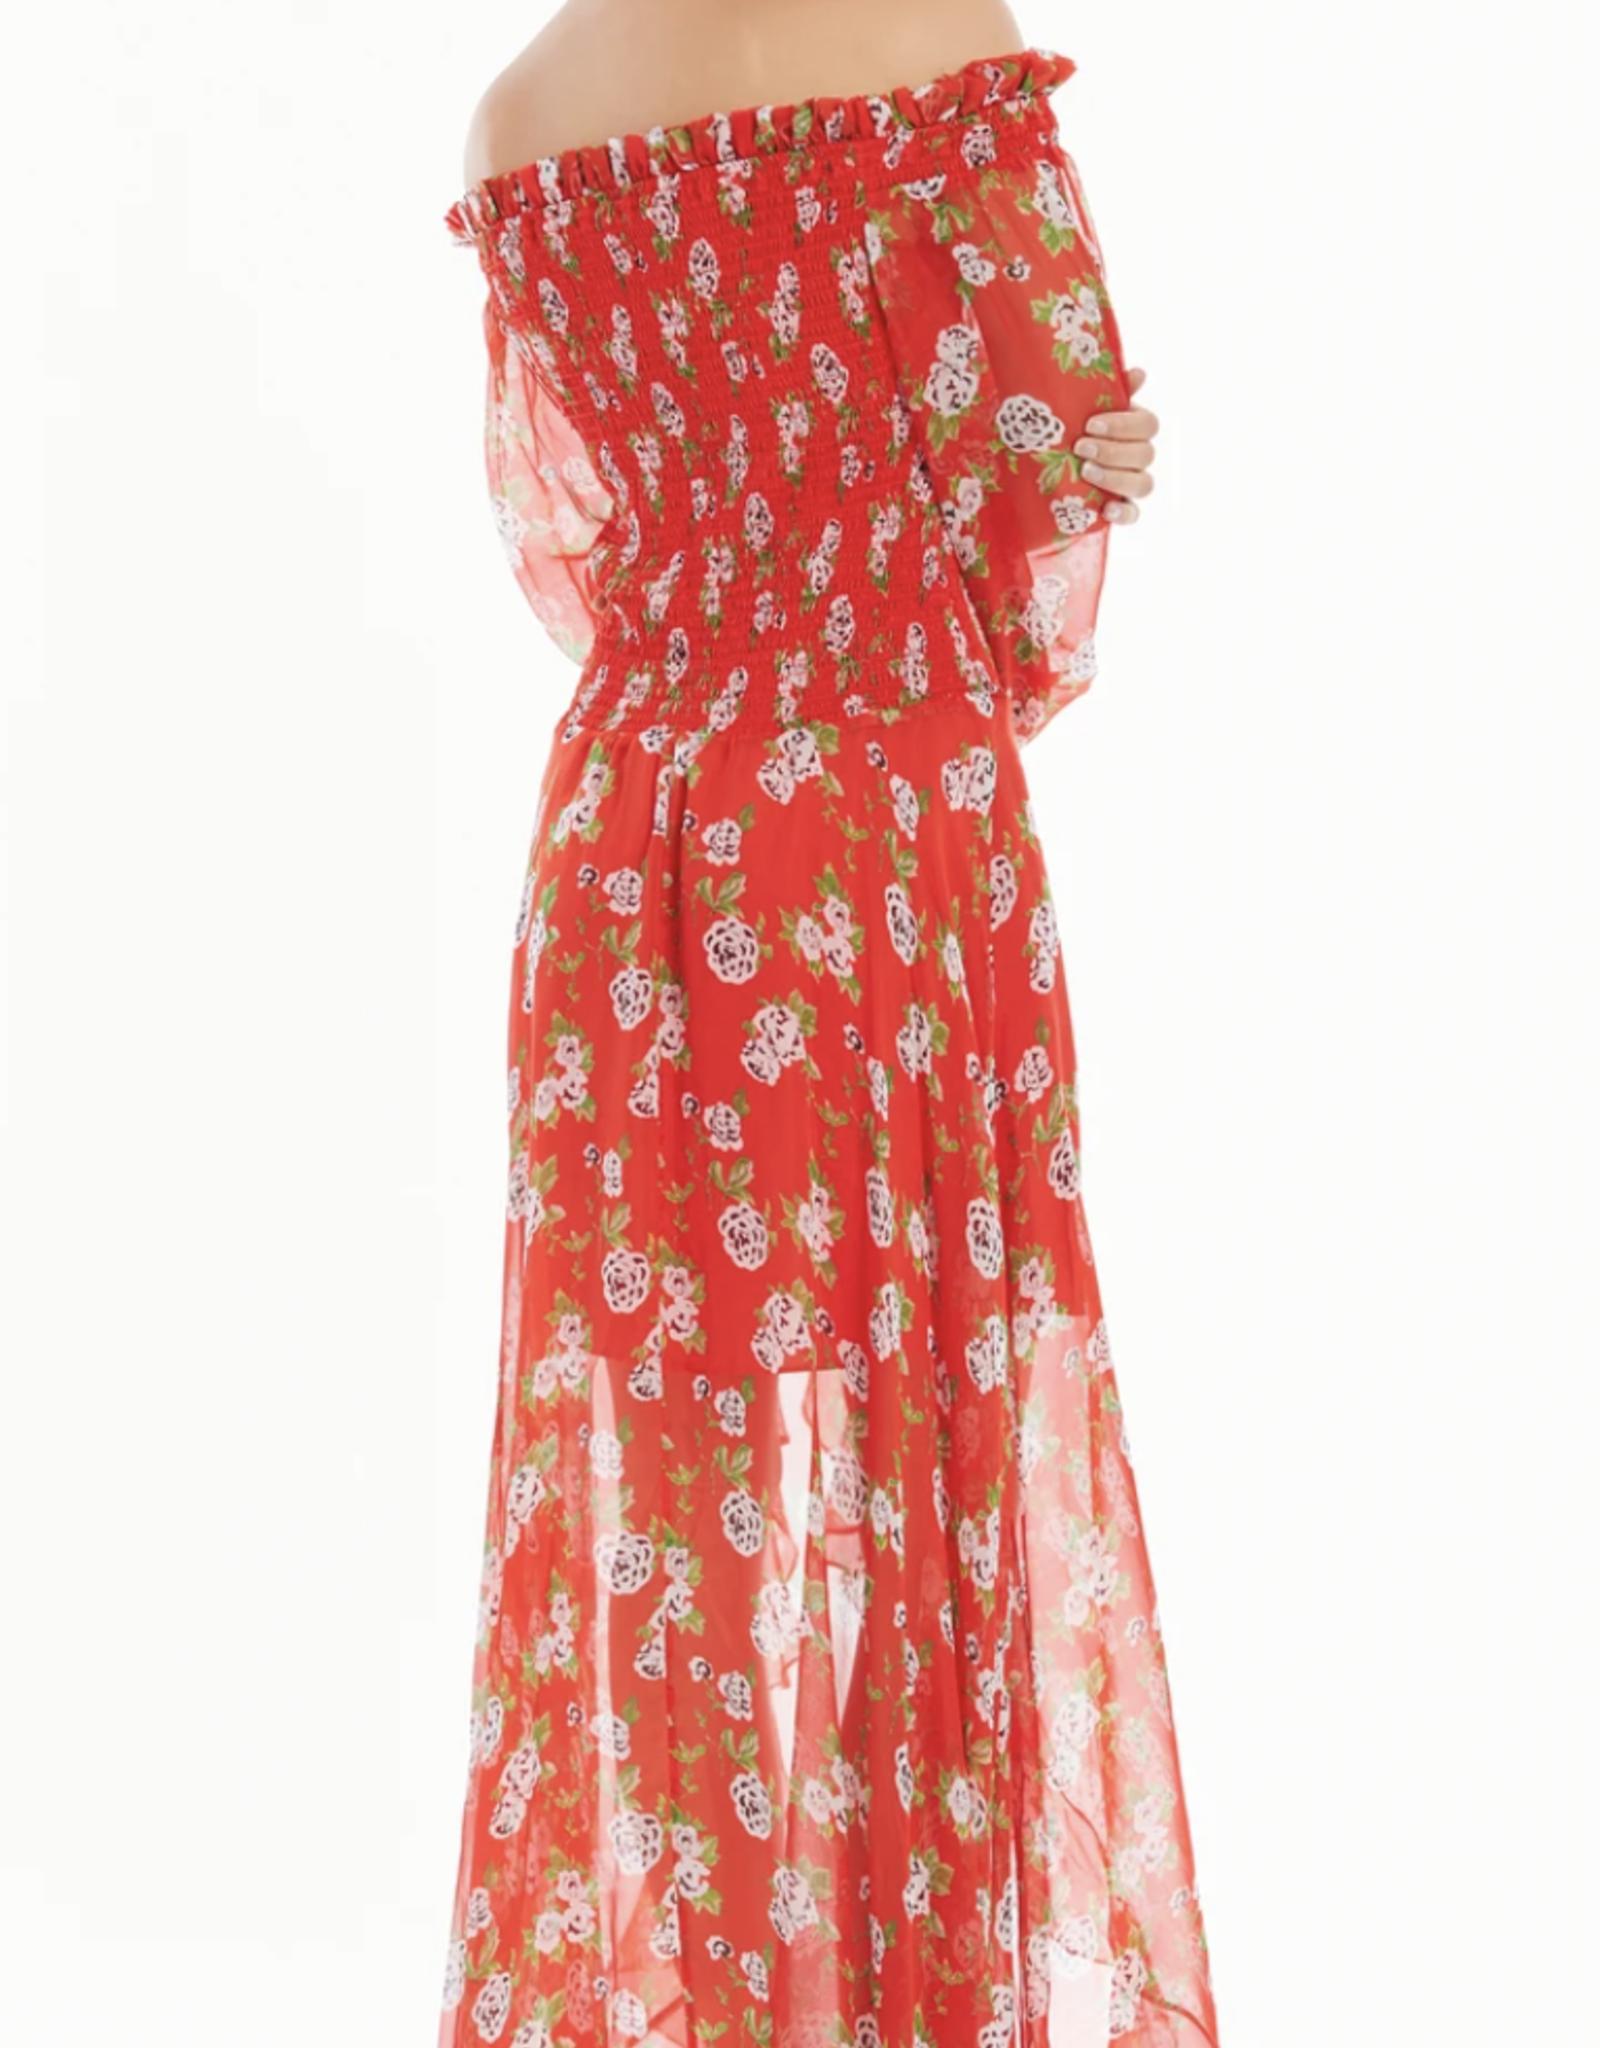 Caroline Constas Ambrosia Gown Red